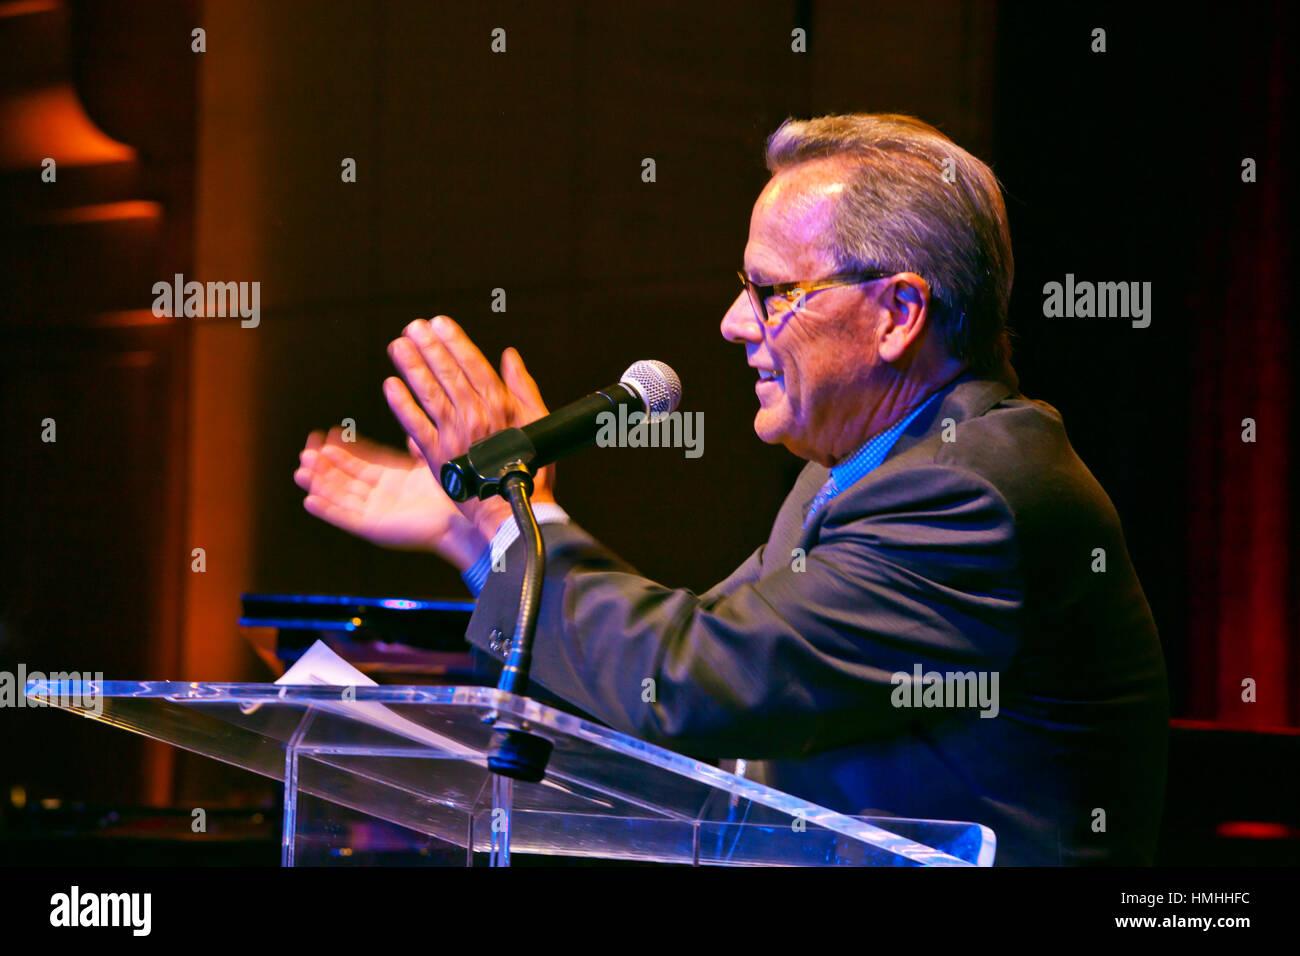 TIM JACKSON speaks at the GALA DINNER of the 59th MONTEREY JAZZ FESTIVAL - MONTEREY, CALIFORNIA Stock Photo